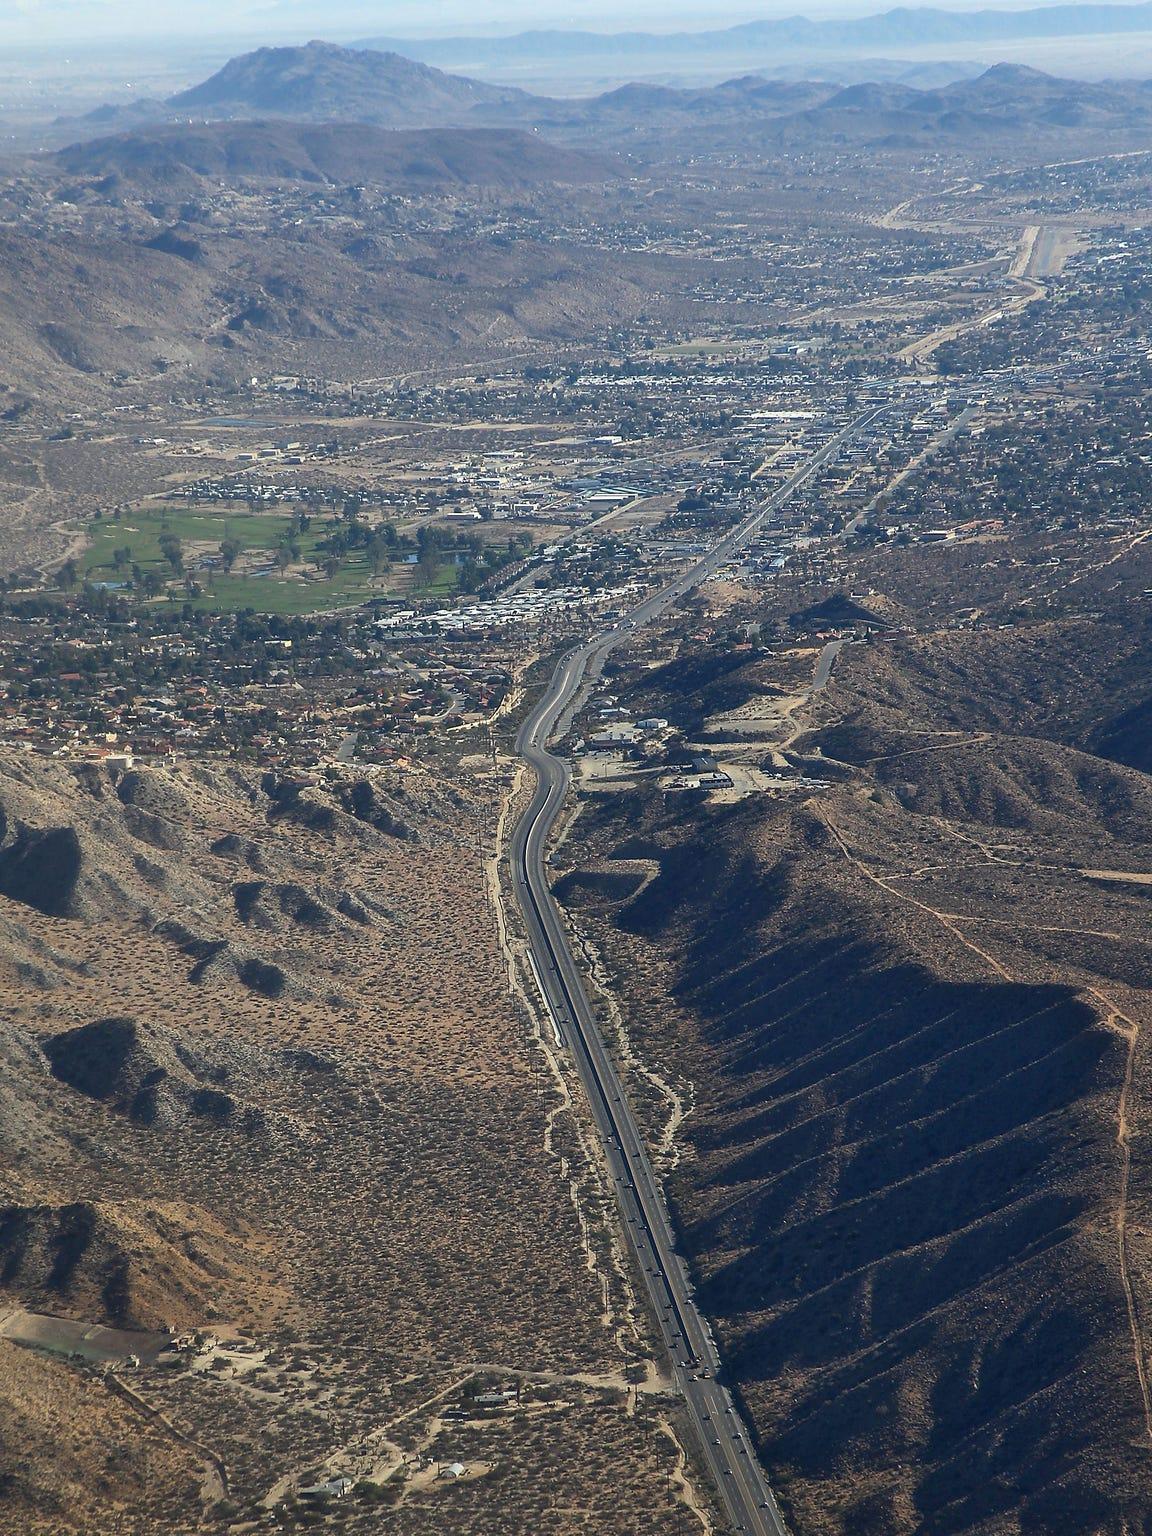 Aerial view of Highway 62.